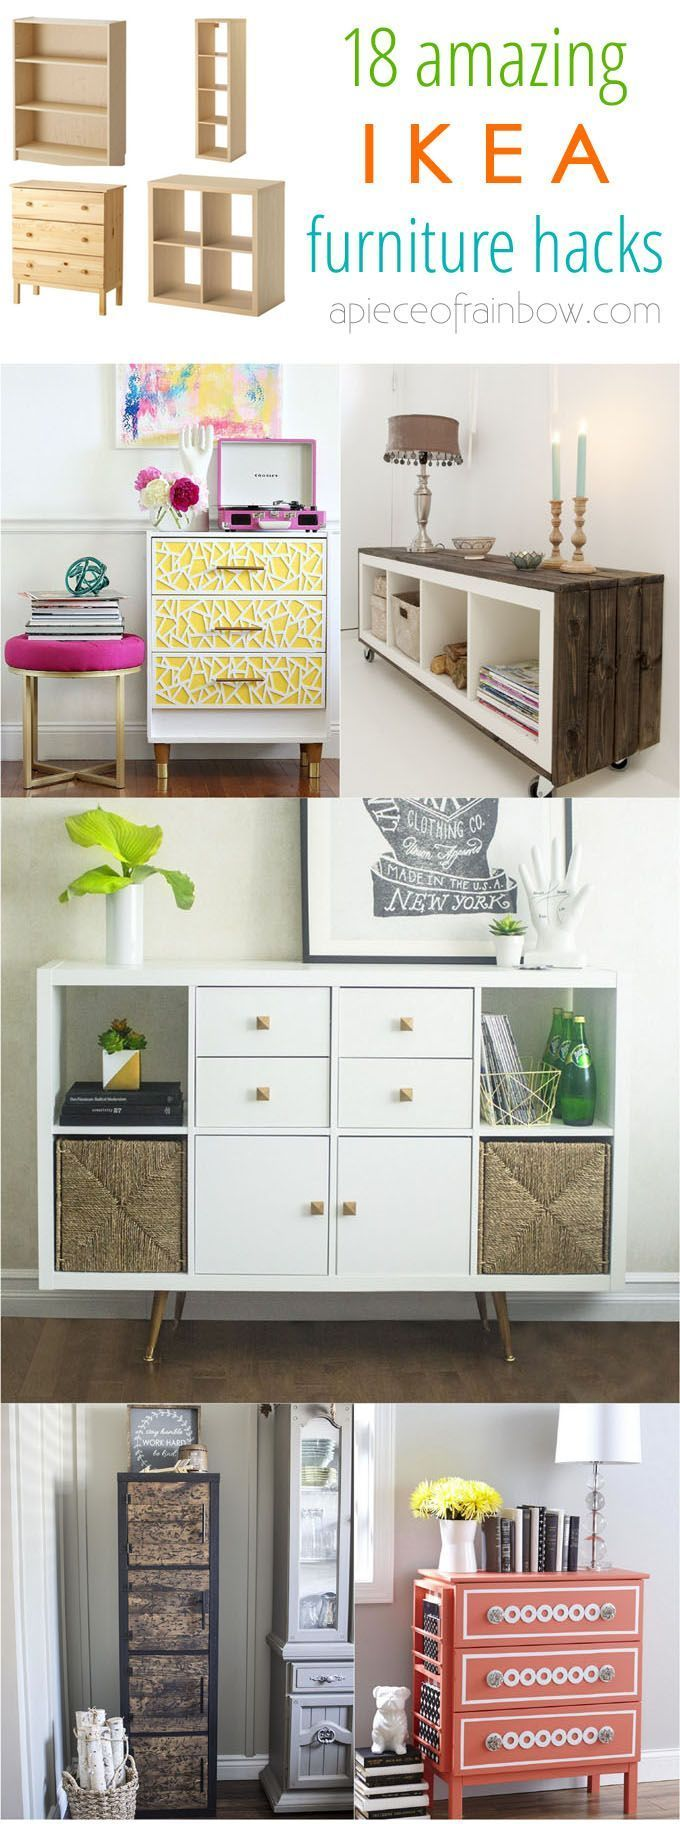 Easy custom furniture with amazing ikea hacks husky pinterest